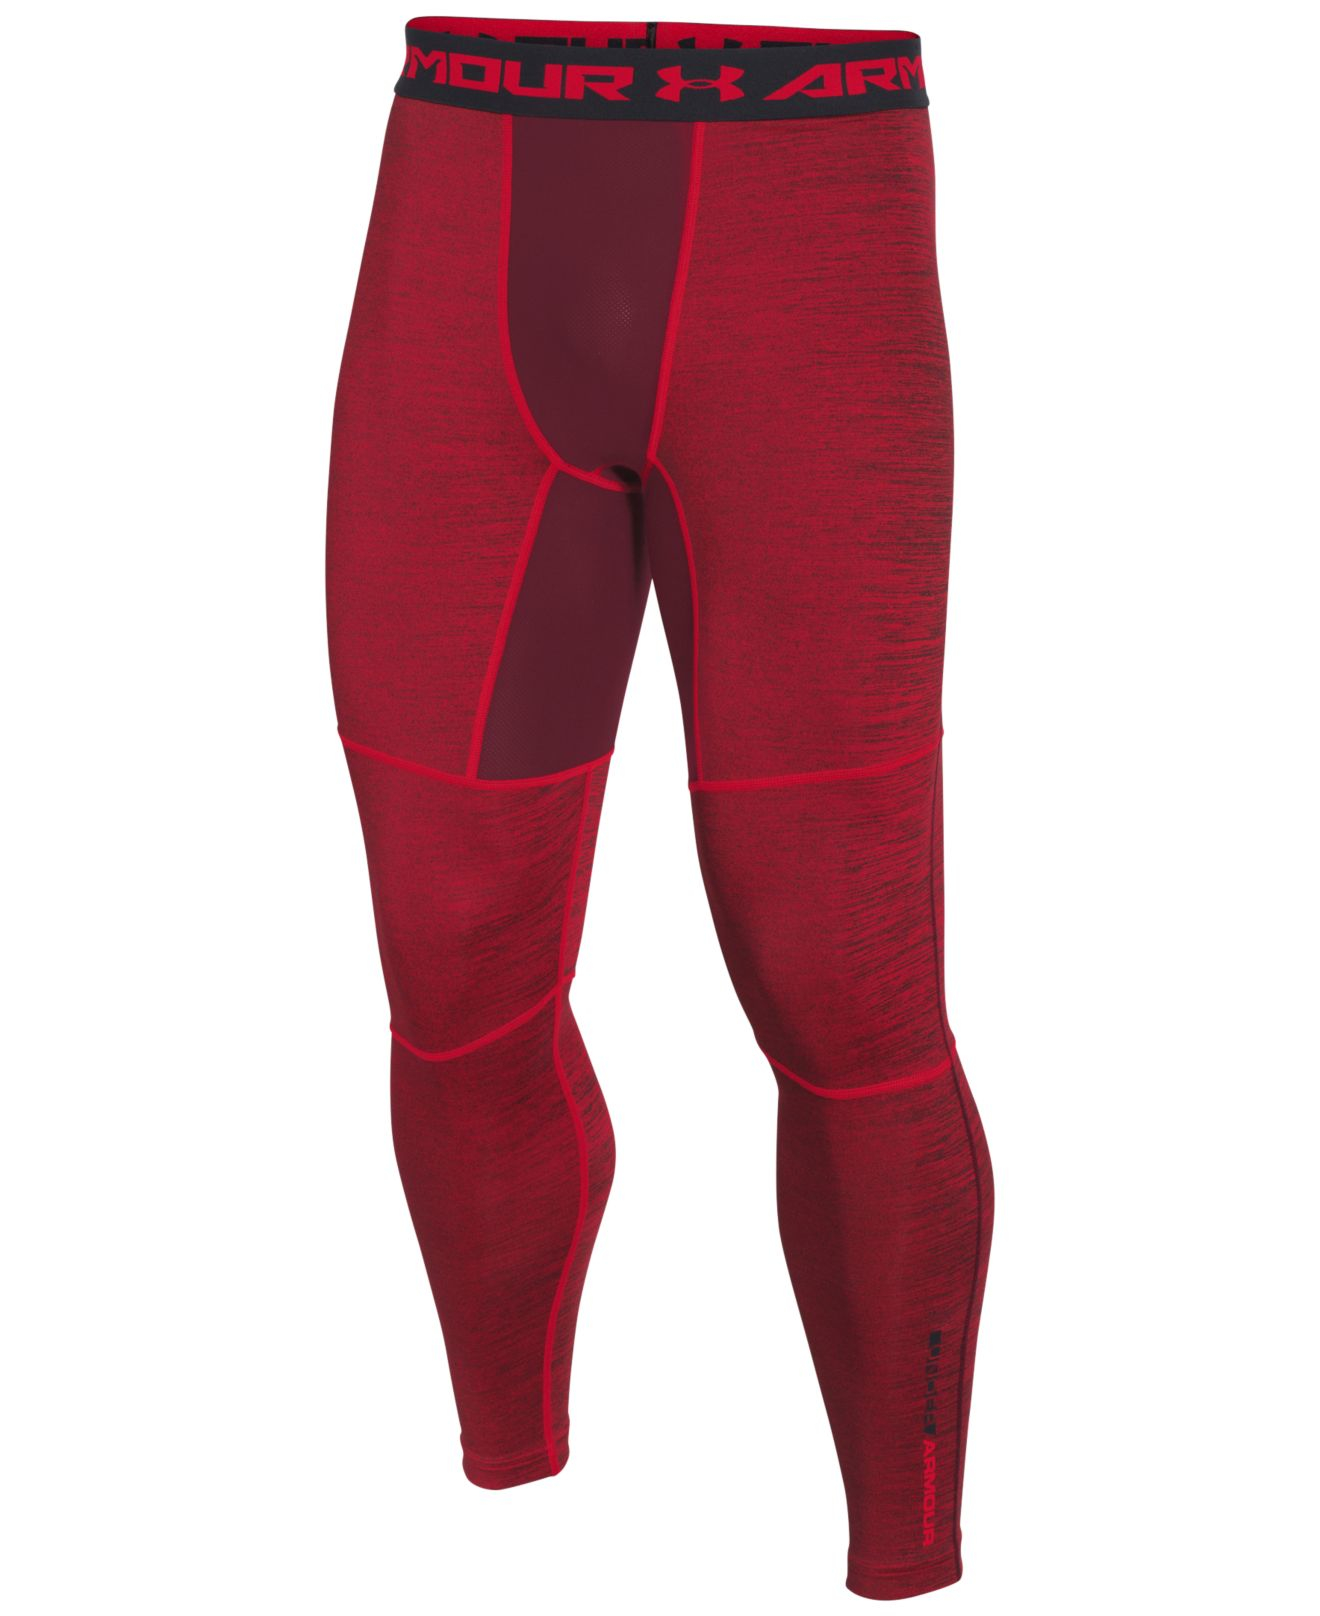 a1206b787d036e Lyst - Under Armour Men's Coldgear® Twisted Leggings in Red for Men under  armour coldgear